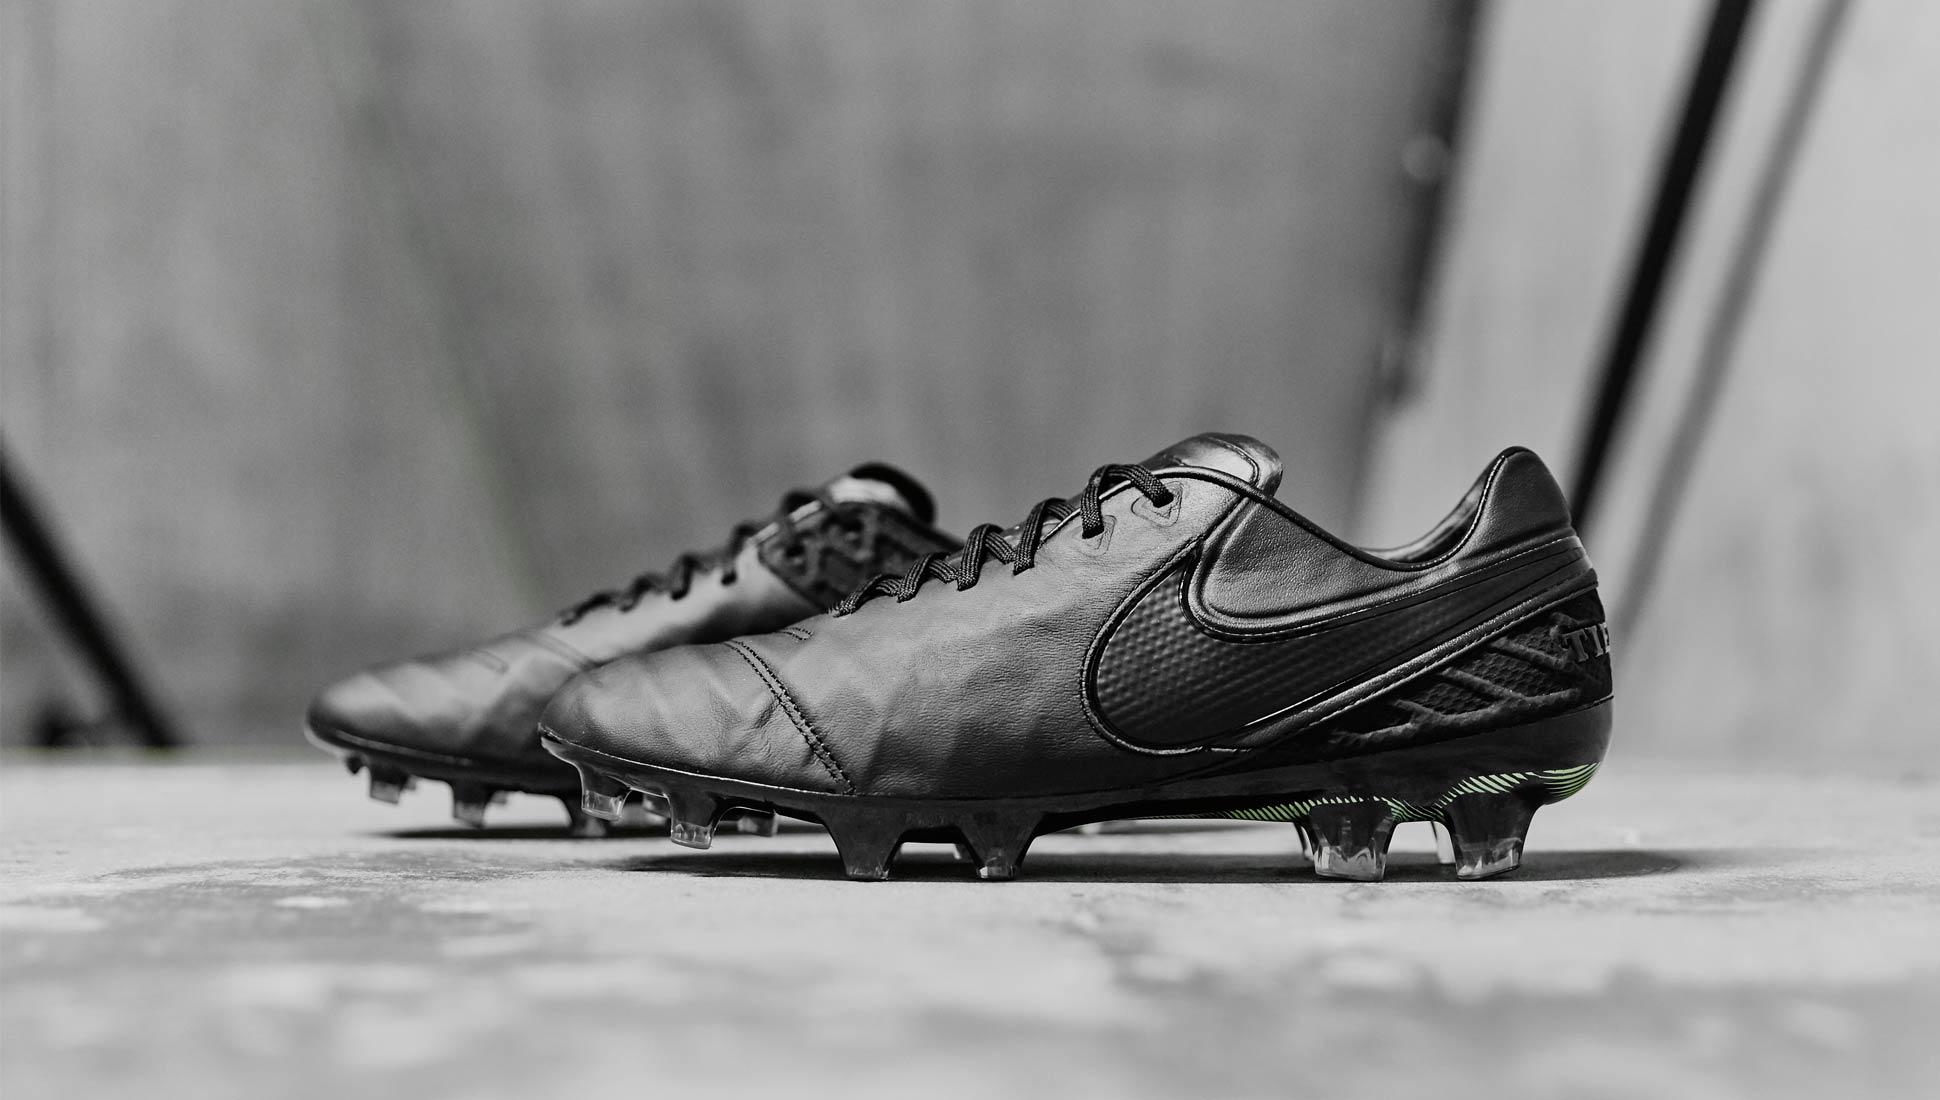 89055cc1d 2016 SoccerBible Top 20 Football Boots - SoccerBible